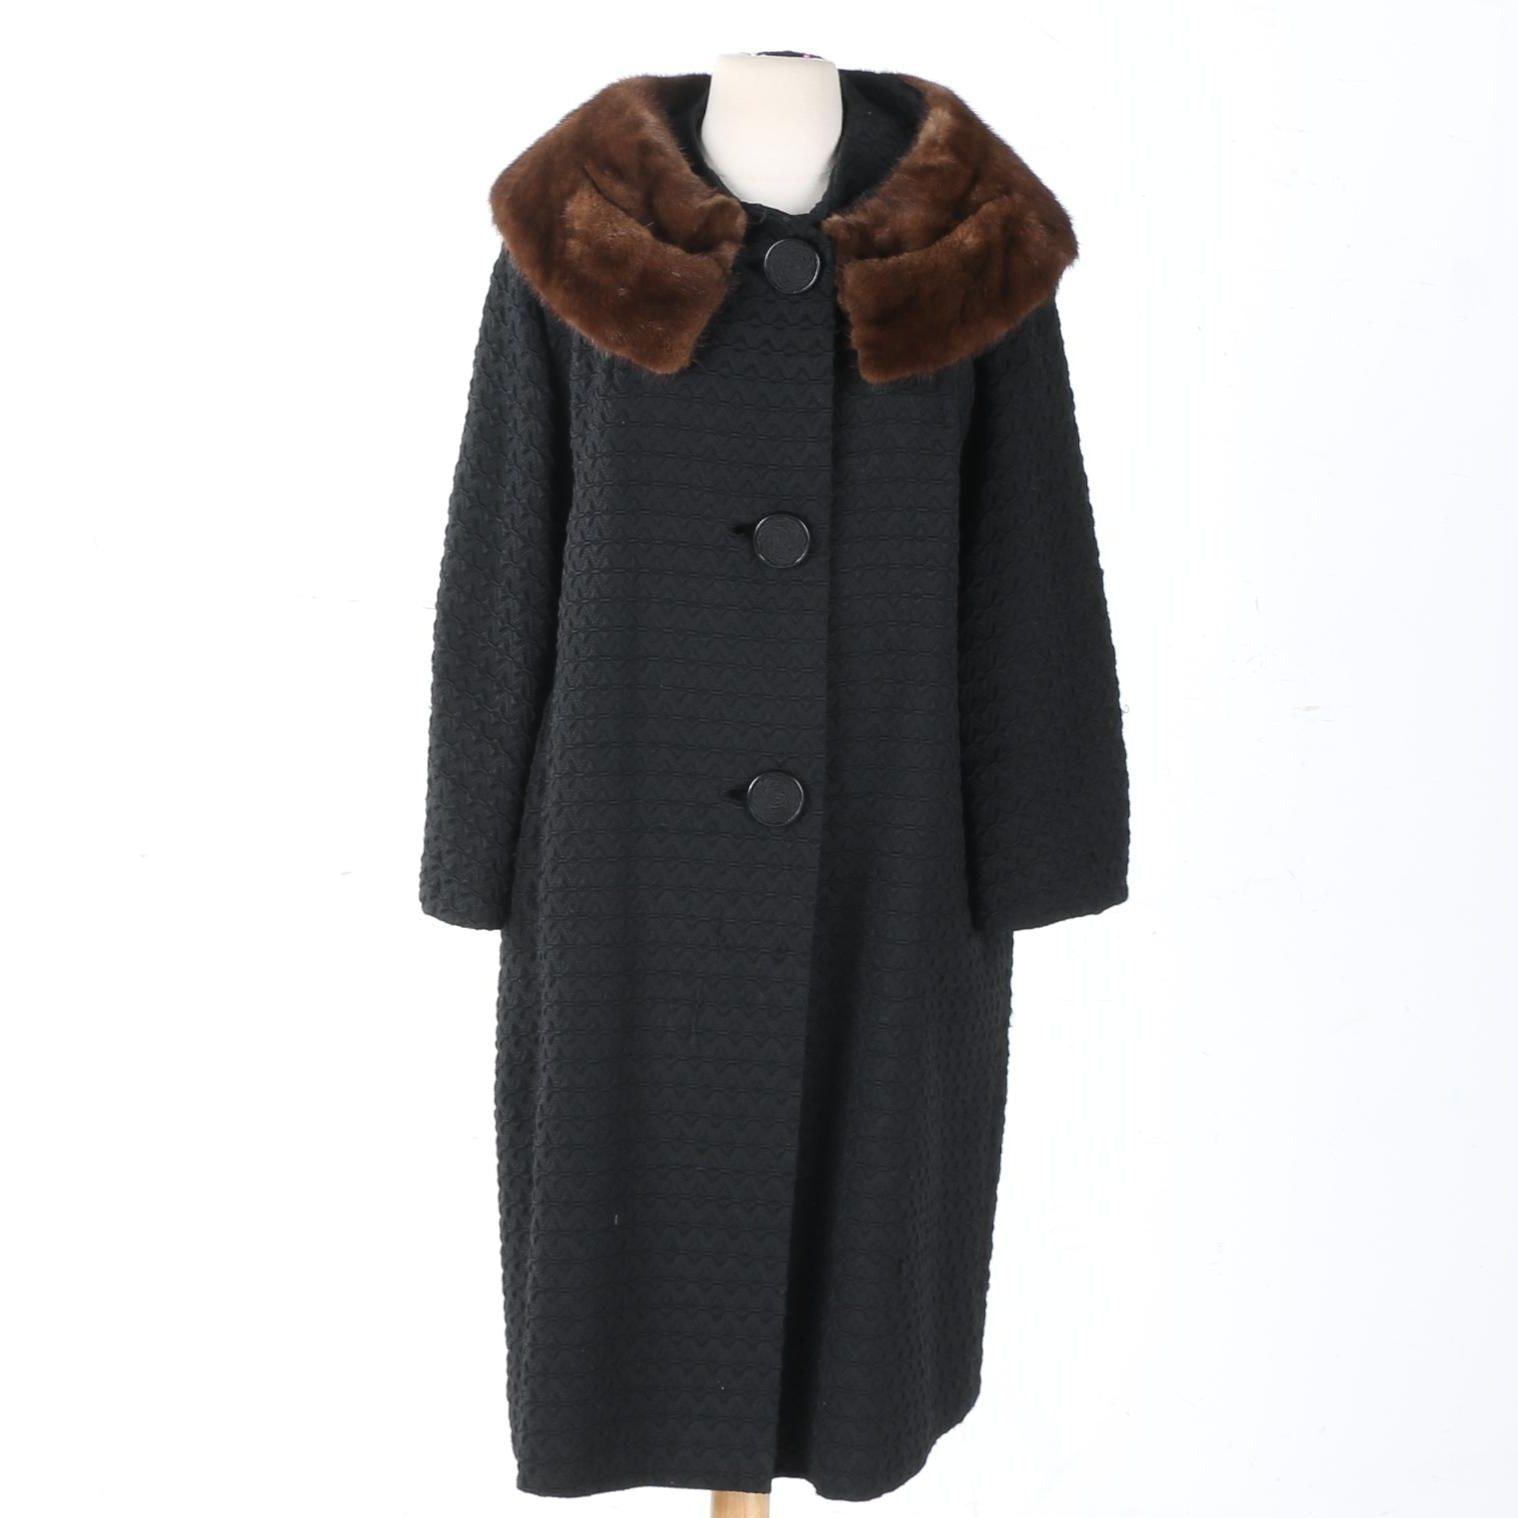 Vintage Dalitzky Coat with Mink Fur Collar